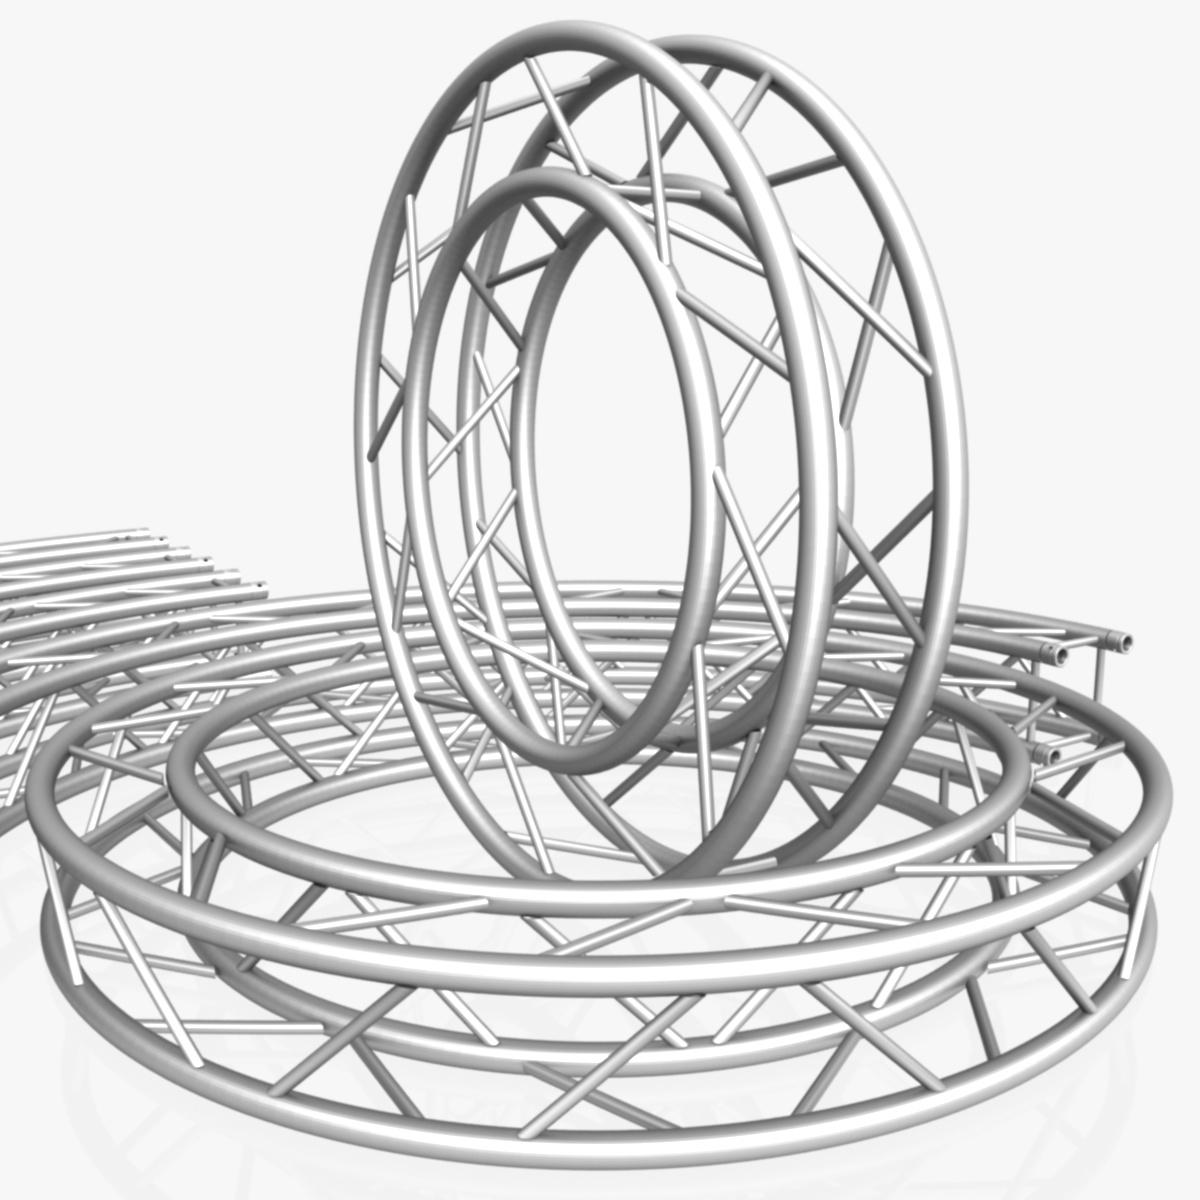 1200x1200 Circle Square Truss Modular Collection 3d Model Architecture 3d